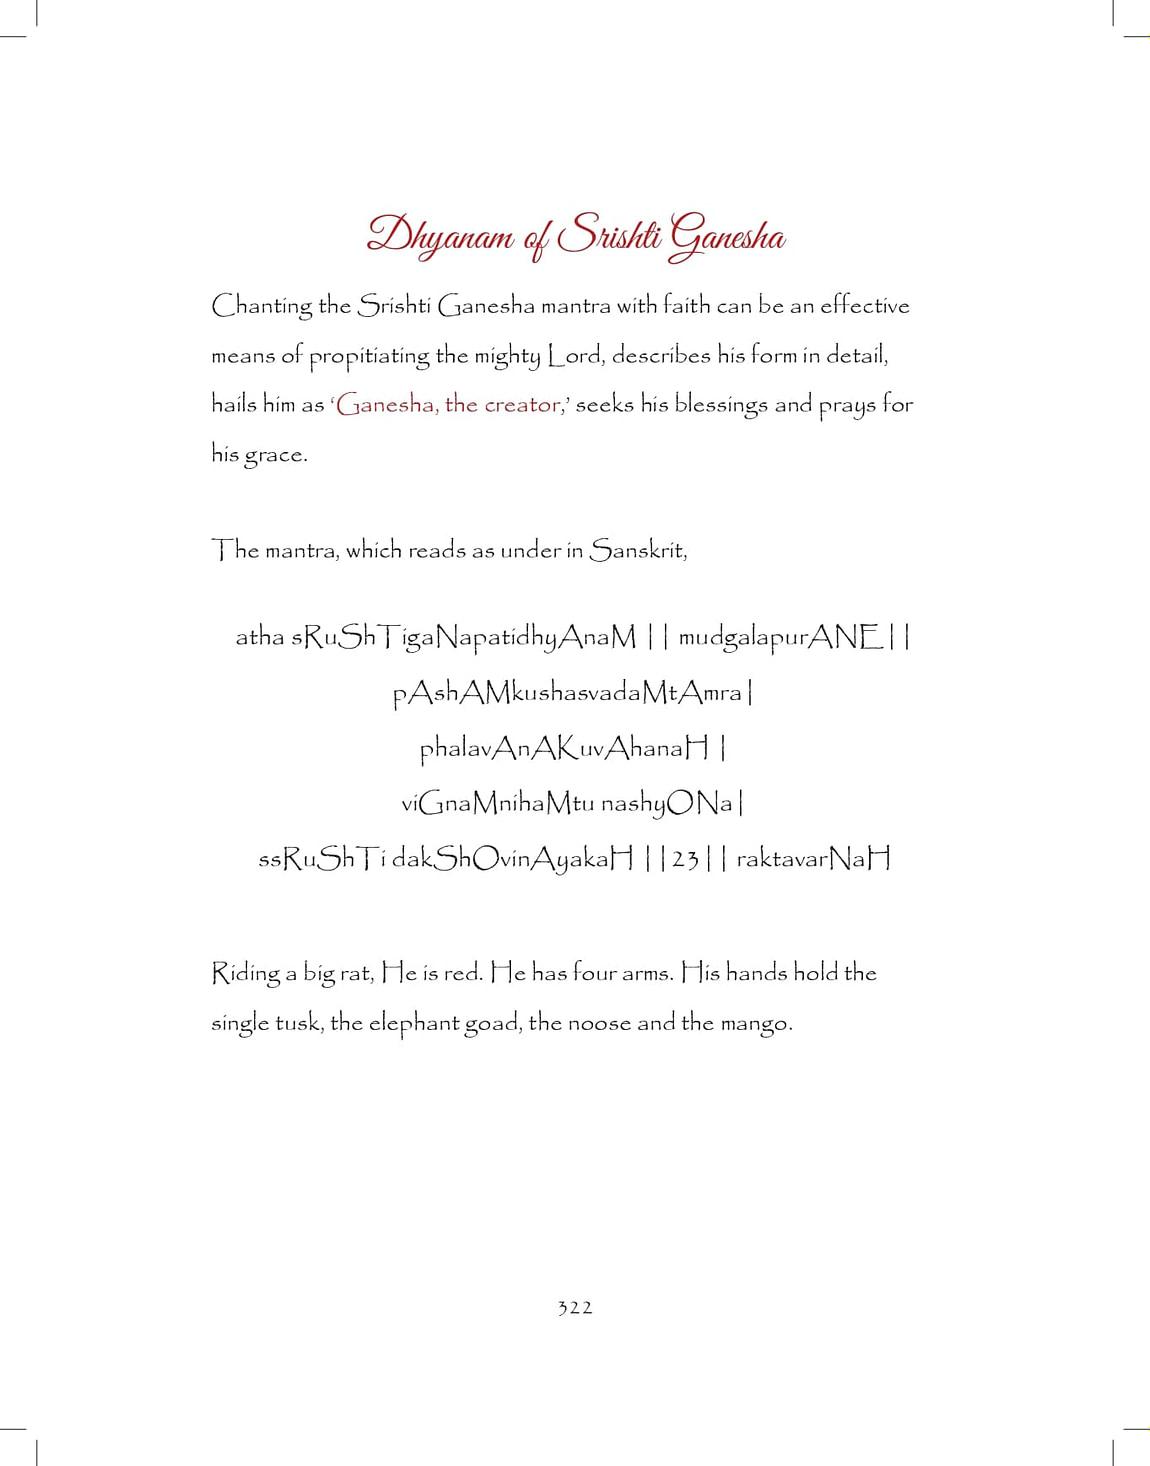 Ganesh-print_pages-to-jpg-0322.jpg